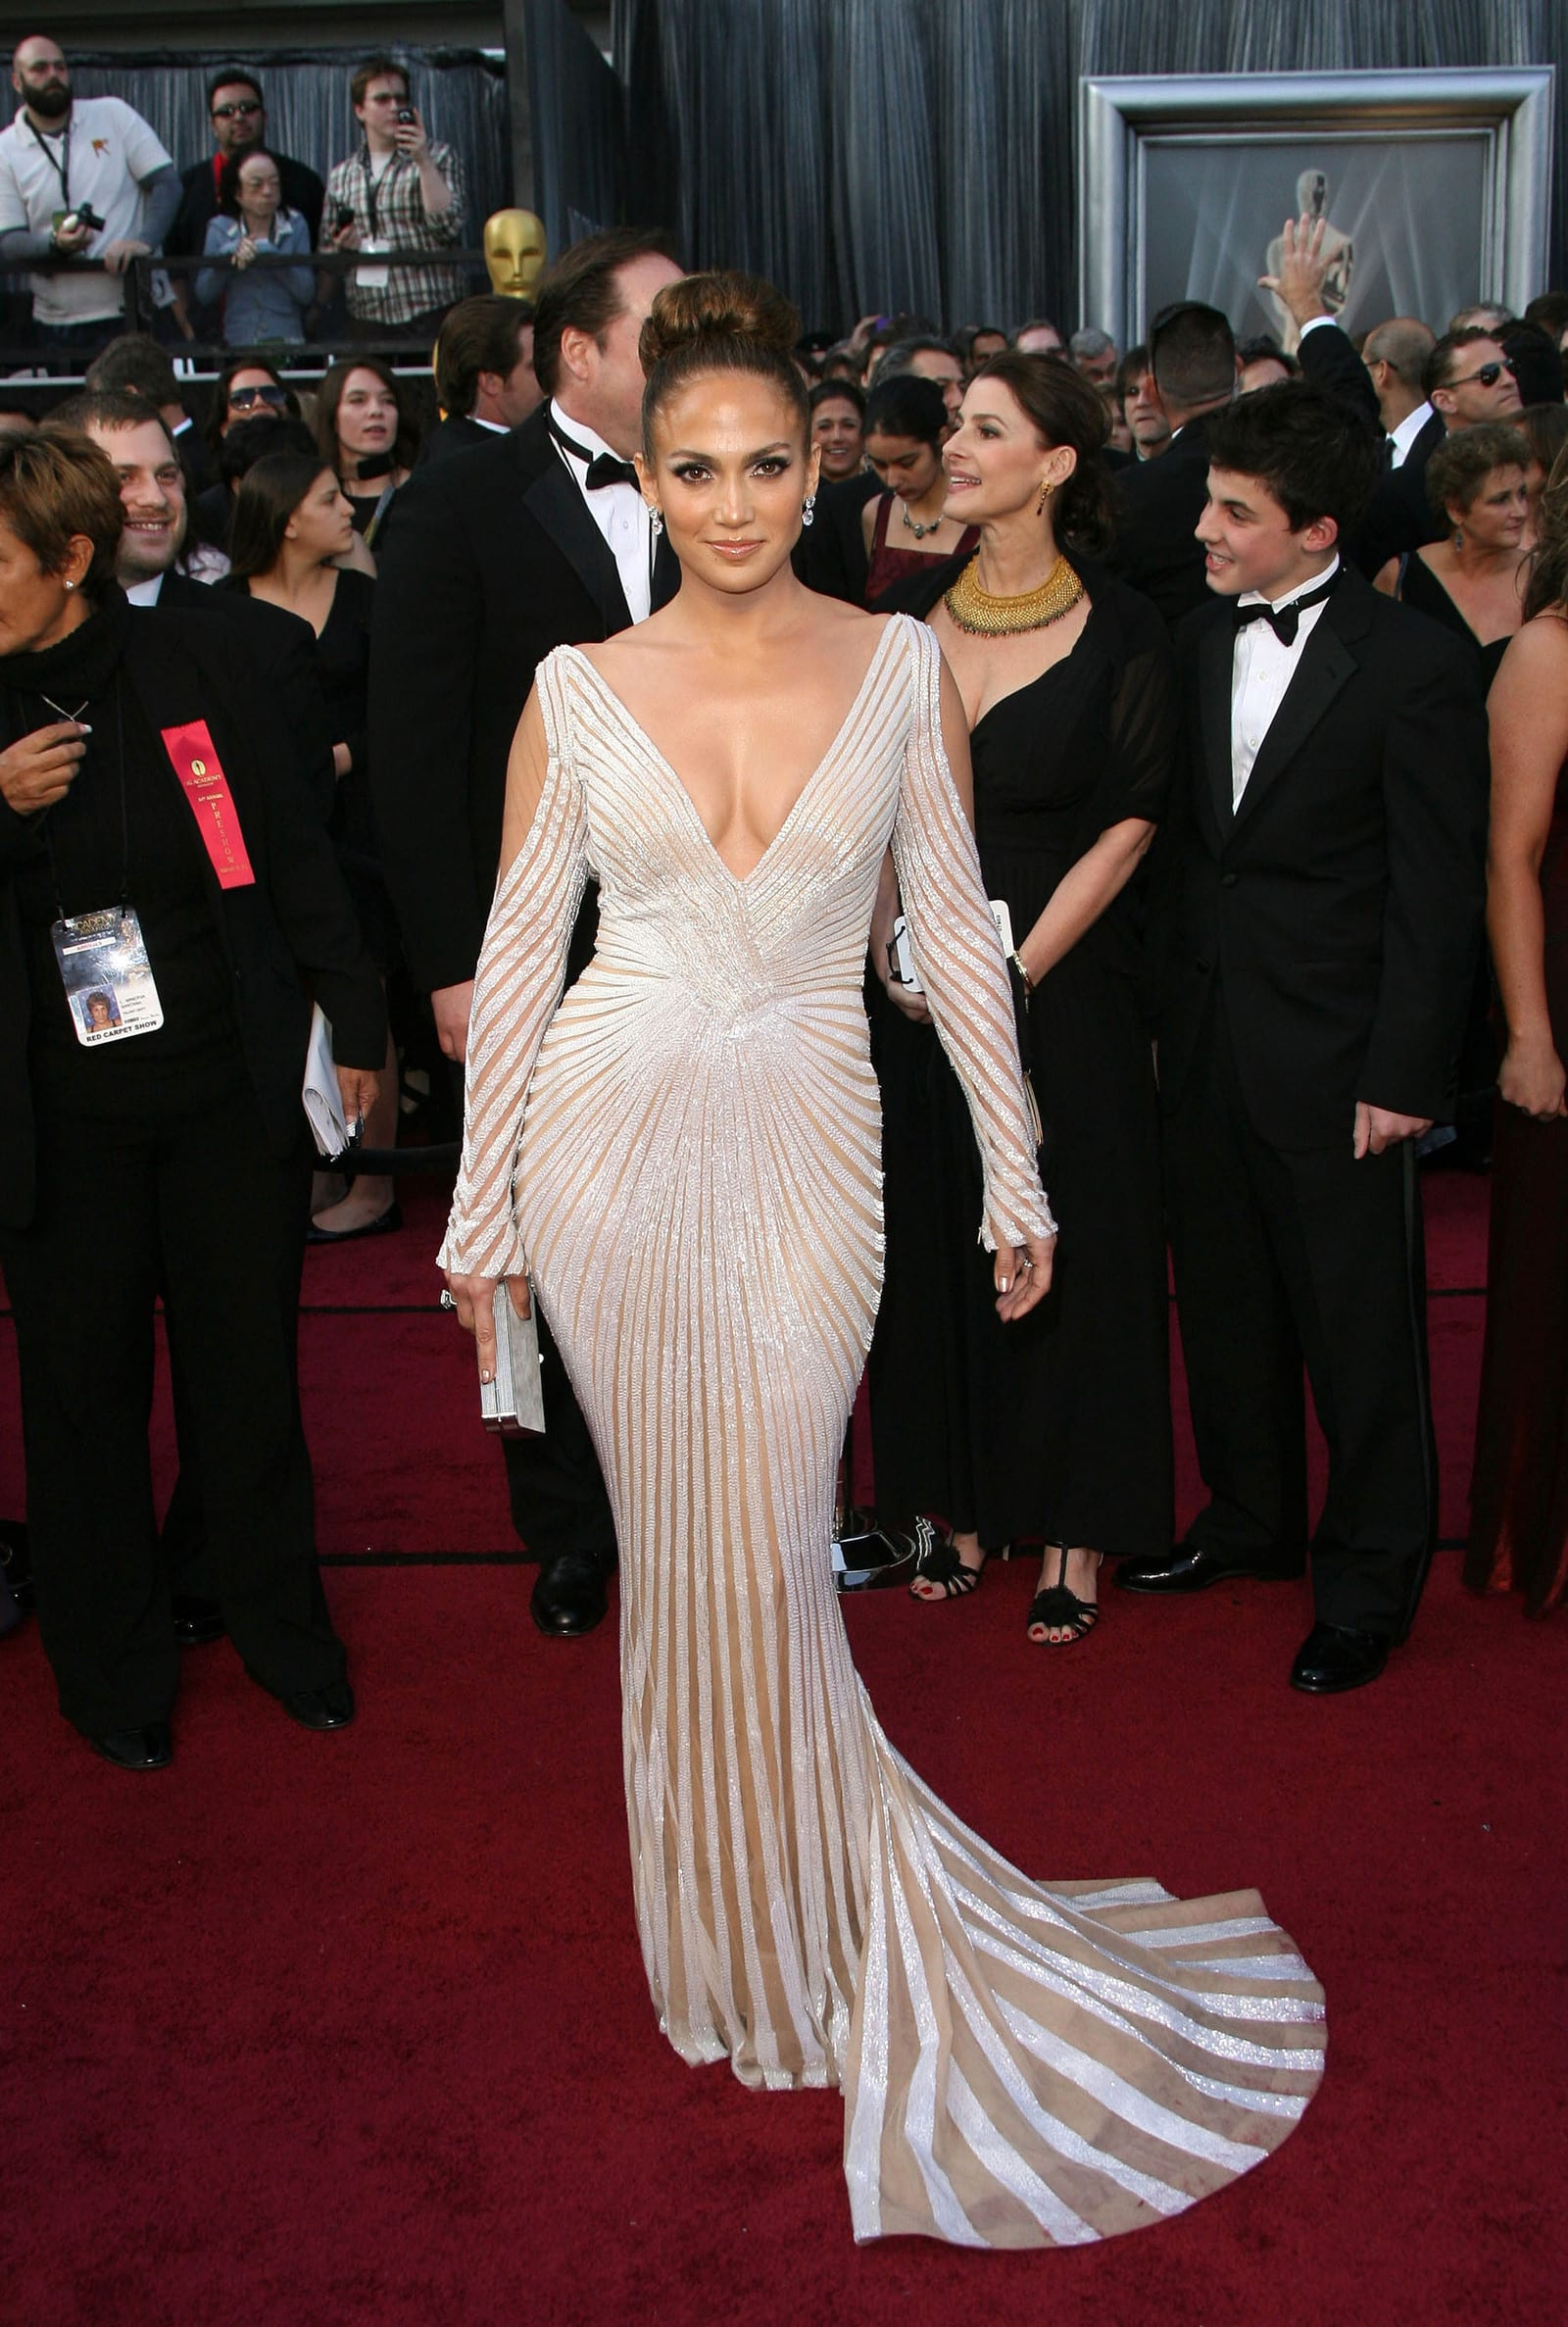 Jennifer Lopez Stylist On Revealing Oscar Dress No Nip Slips Here